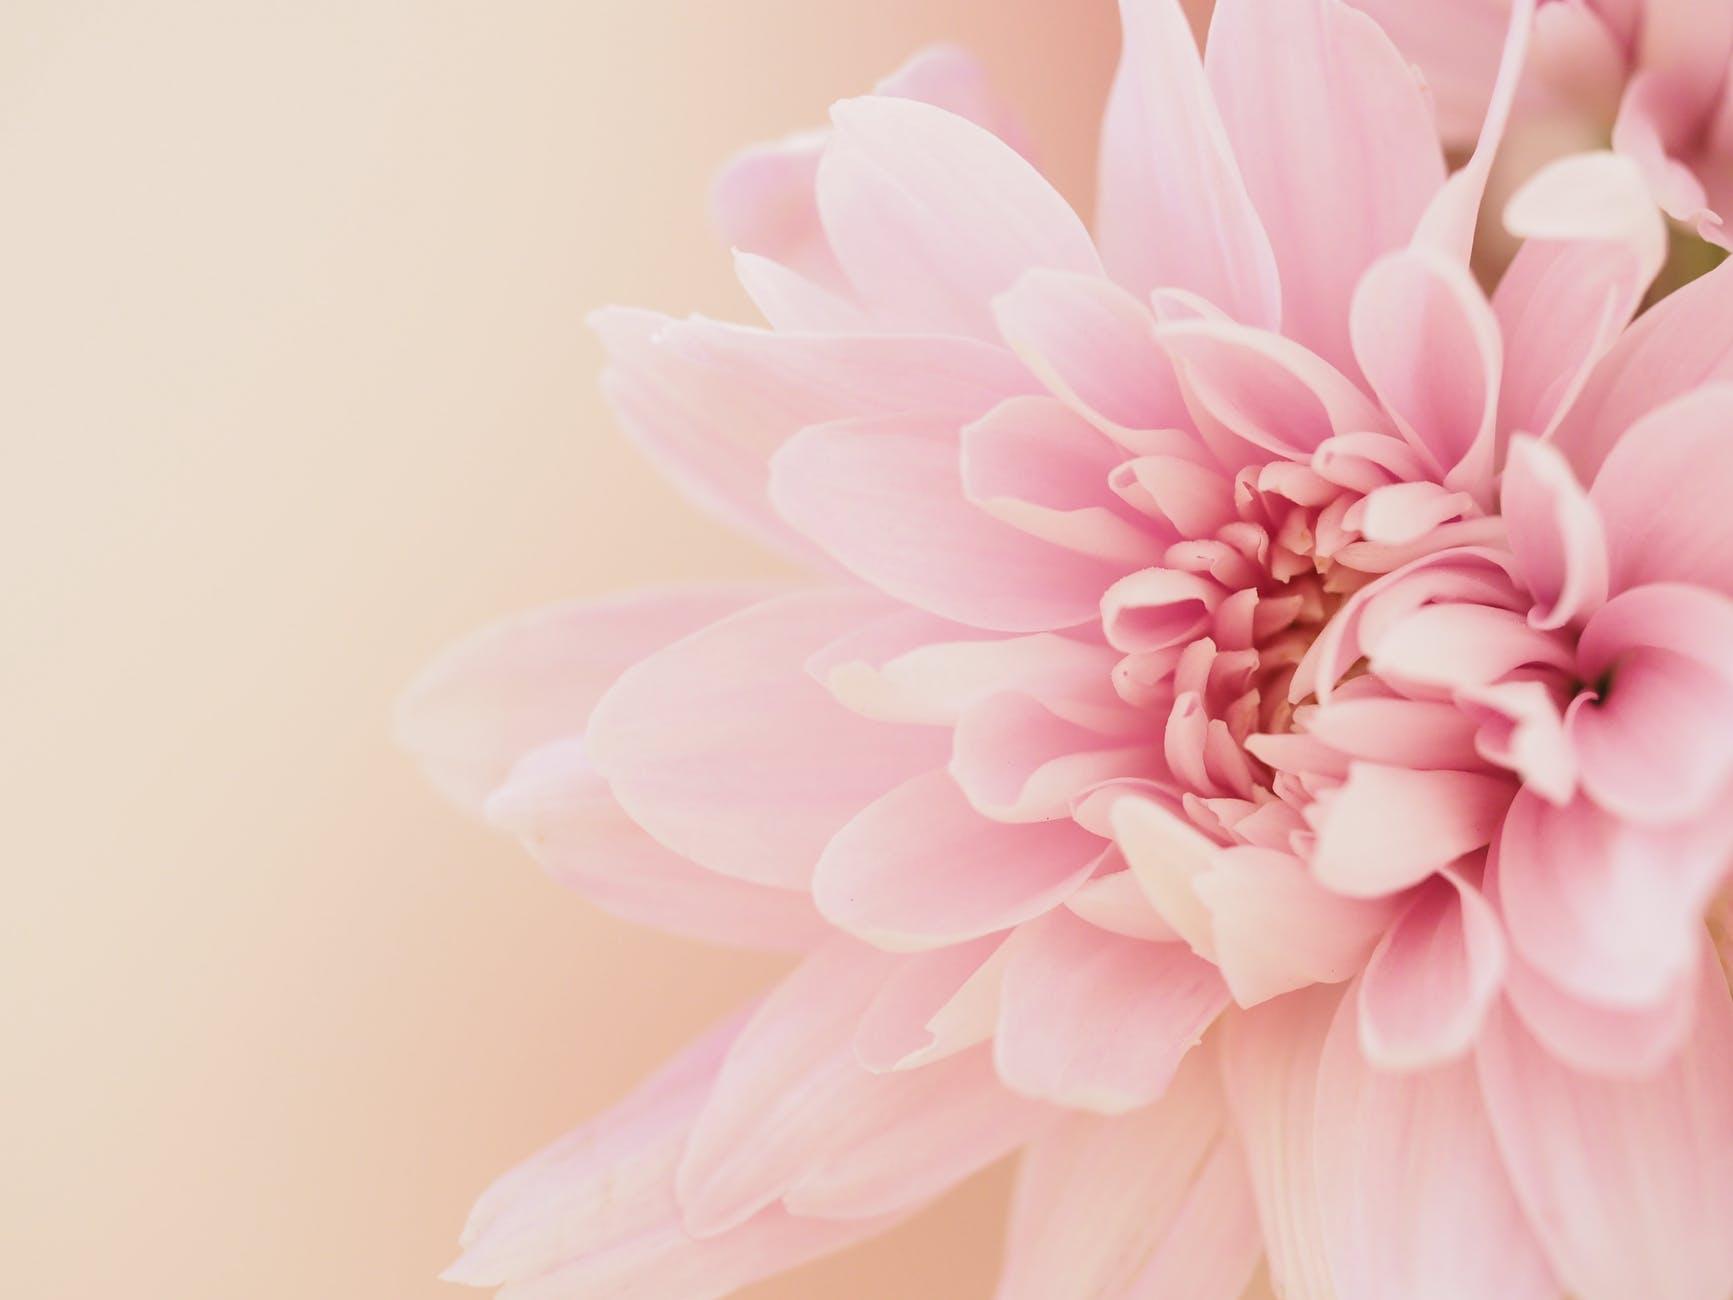 dahlia flower on light pink background